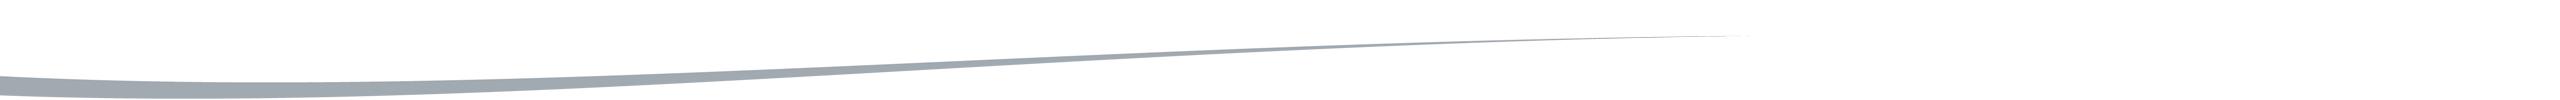 banner curve